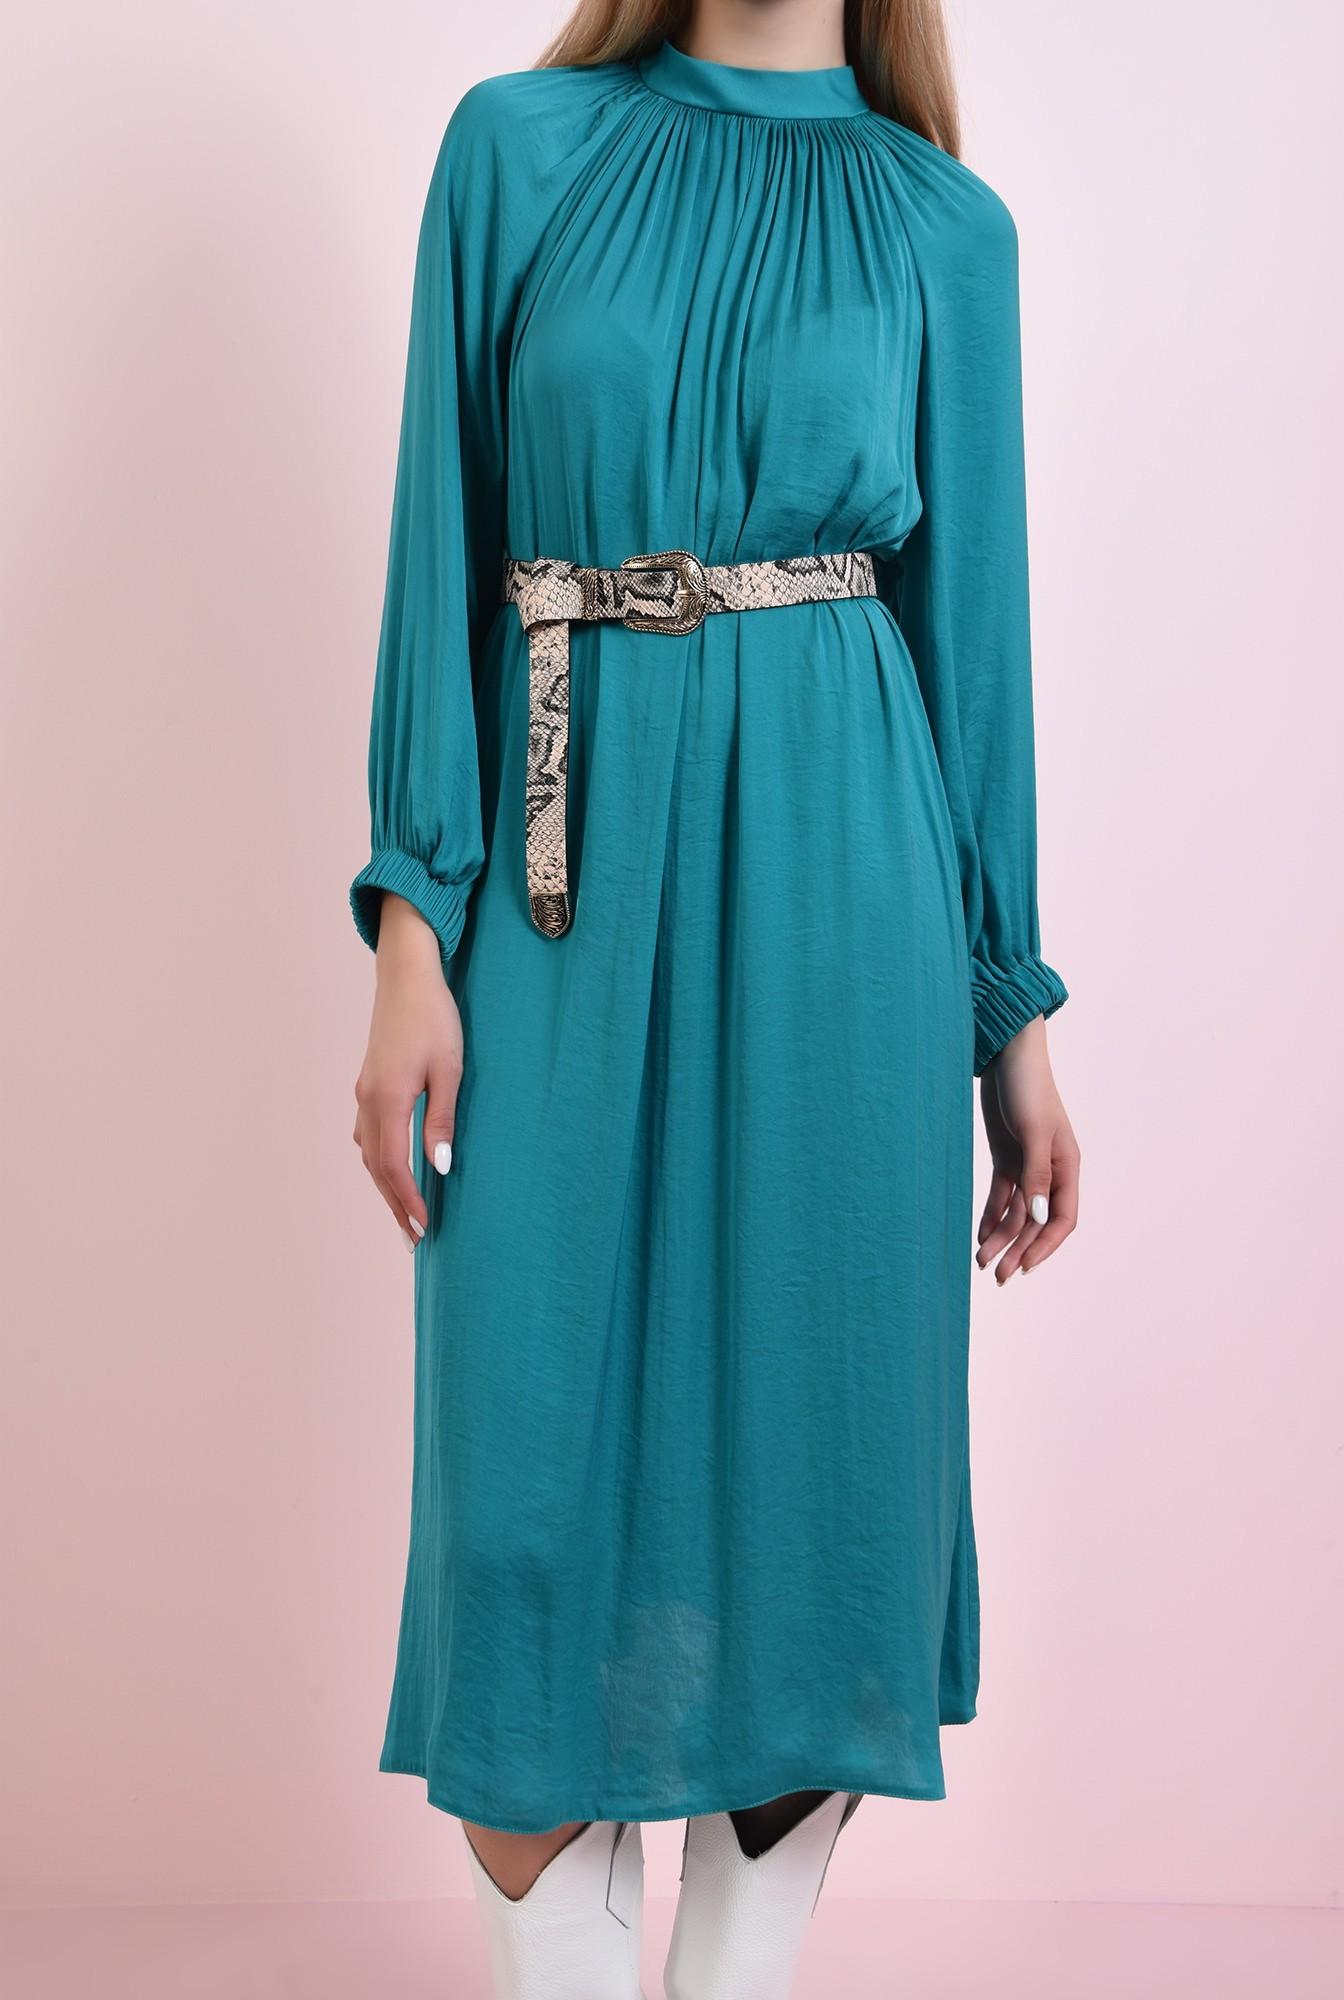 360 - rochie midi, verde, din satin